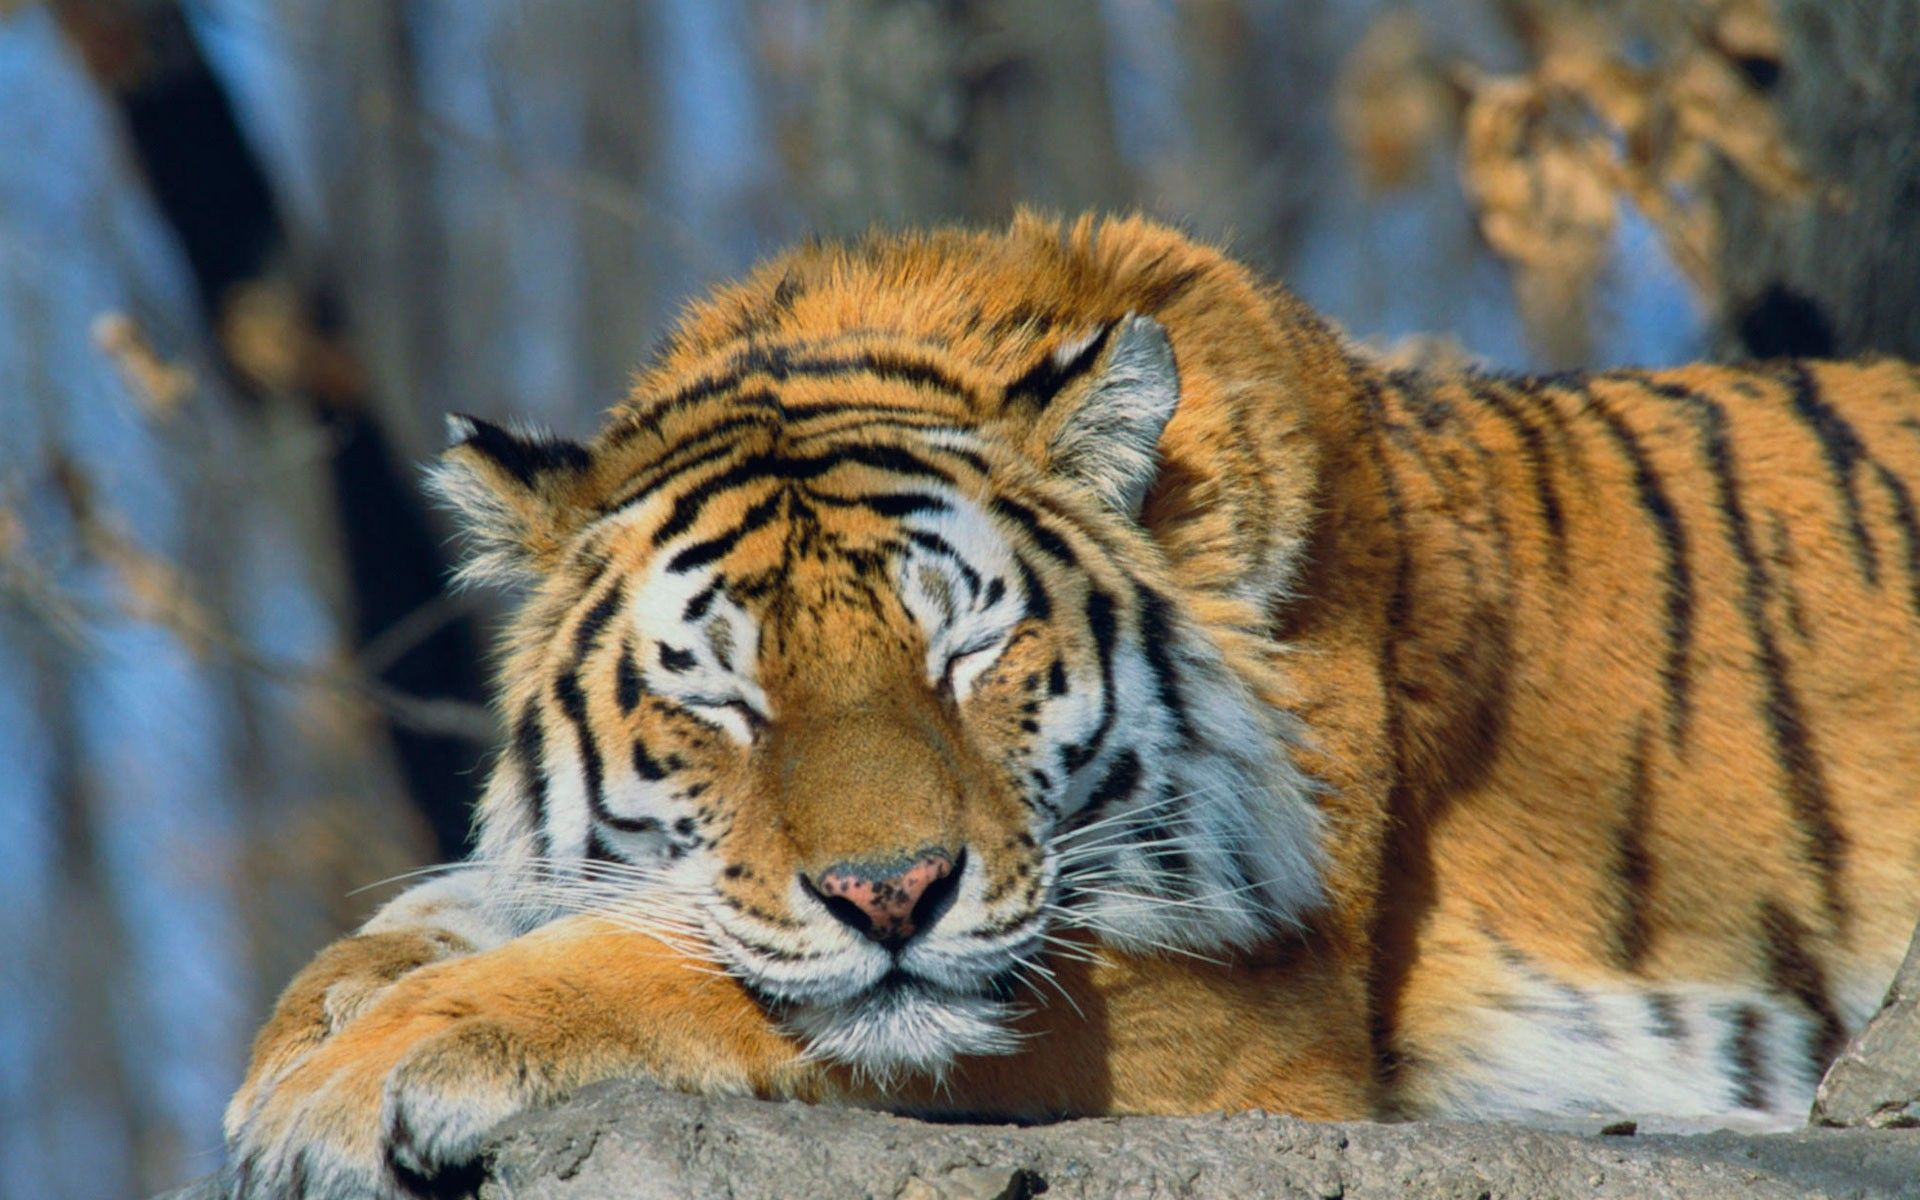 wildlife nature Sleeping tiger